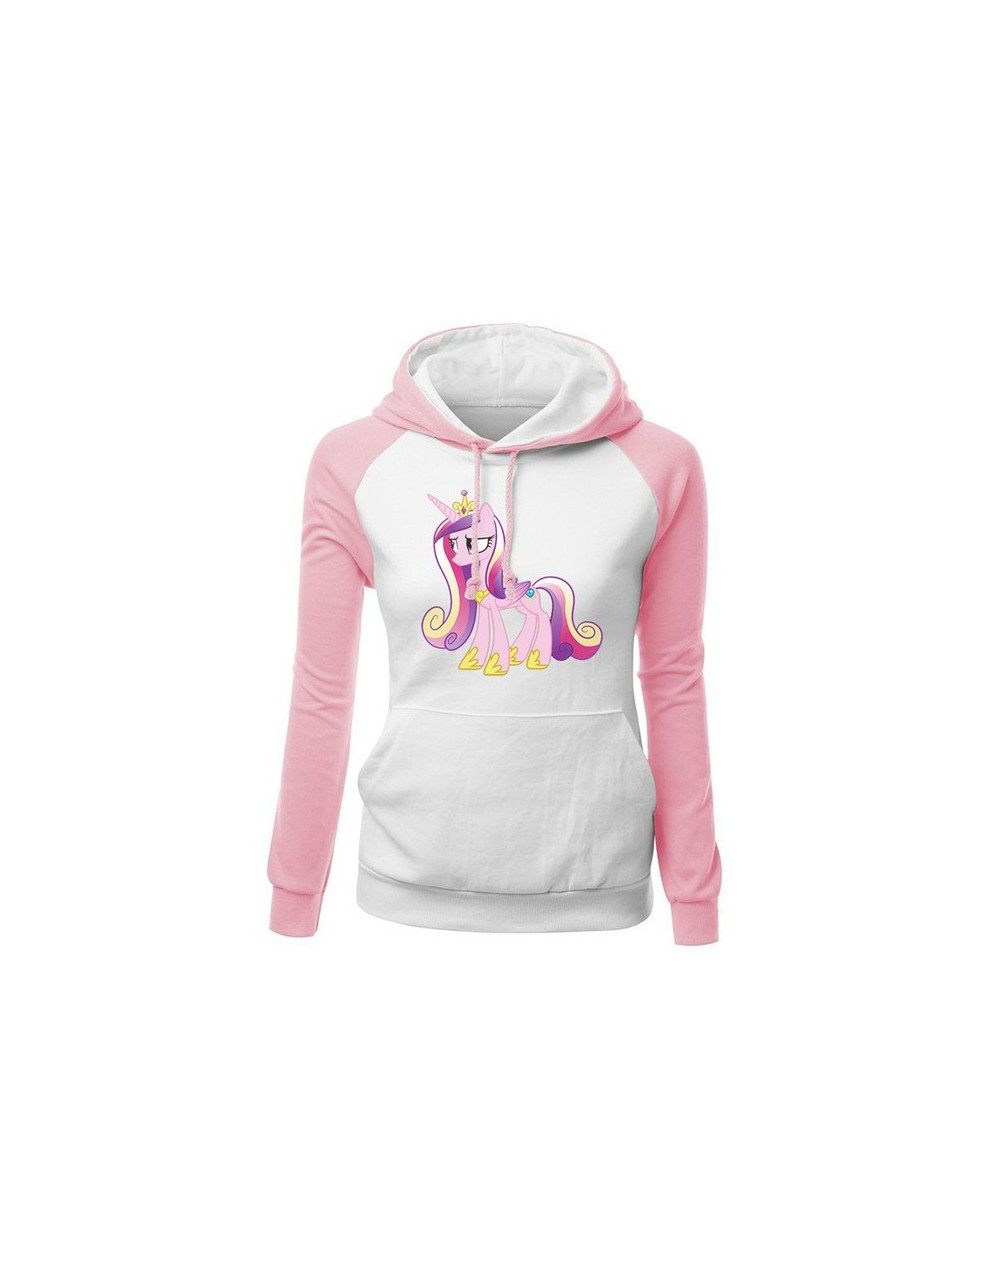 Unicorn Print Women Hoodies Sweatshirts 2019 Harajuku Casual Long Sleeve Pullovers Female big Size Tops hoody - X181 1 - 42...